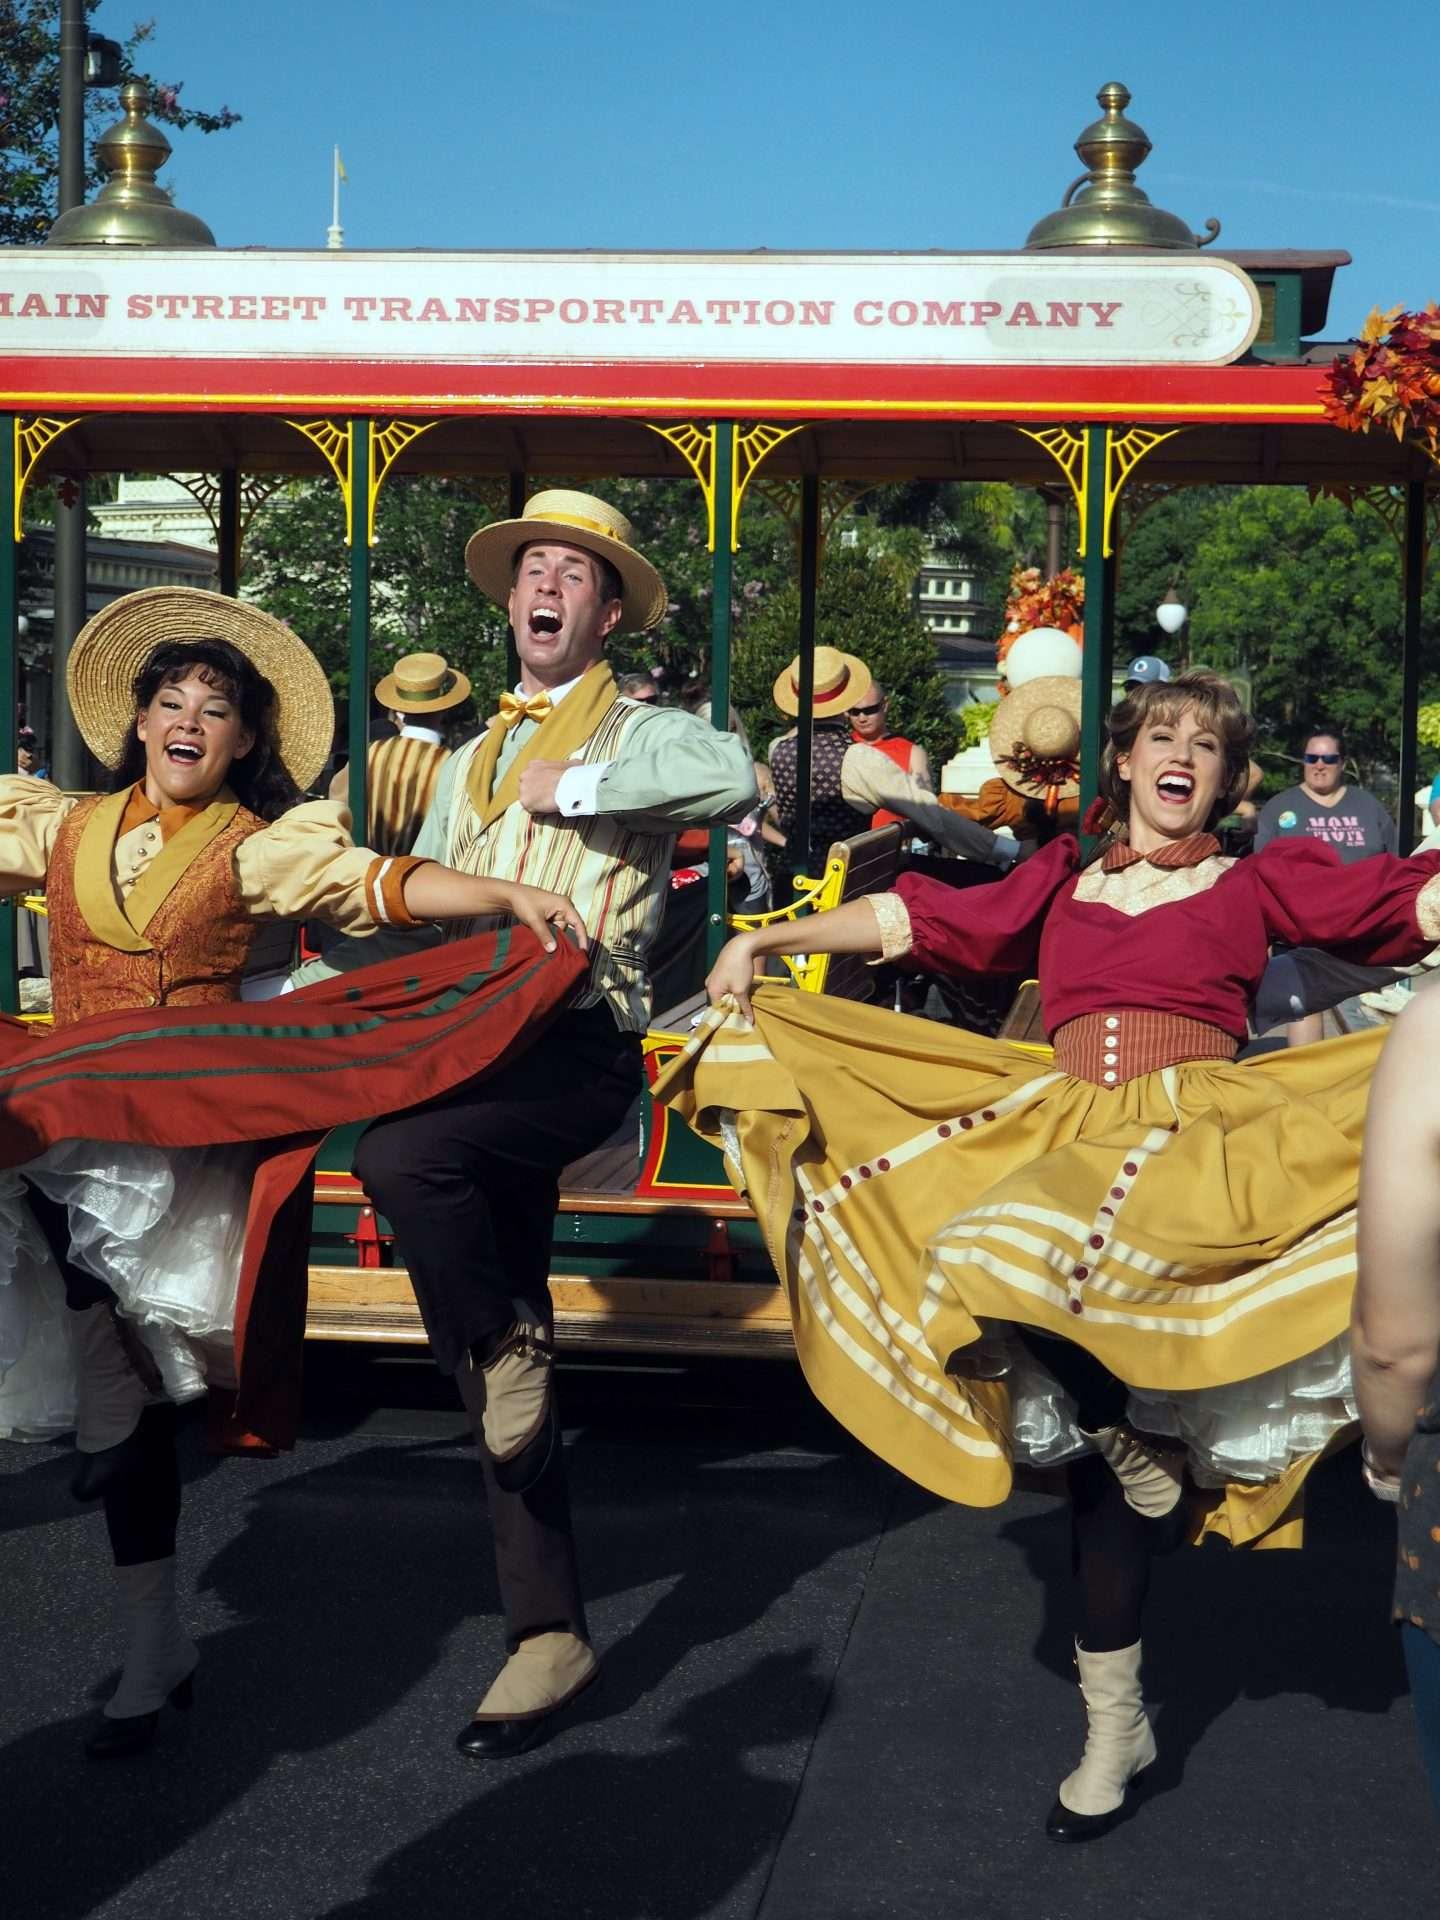 Main Street Trolley Dancers Fall